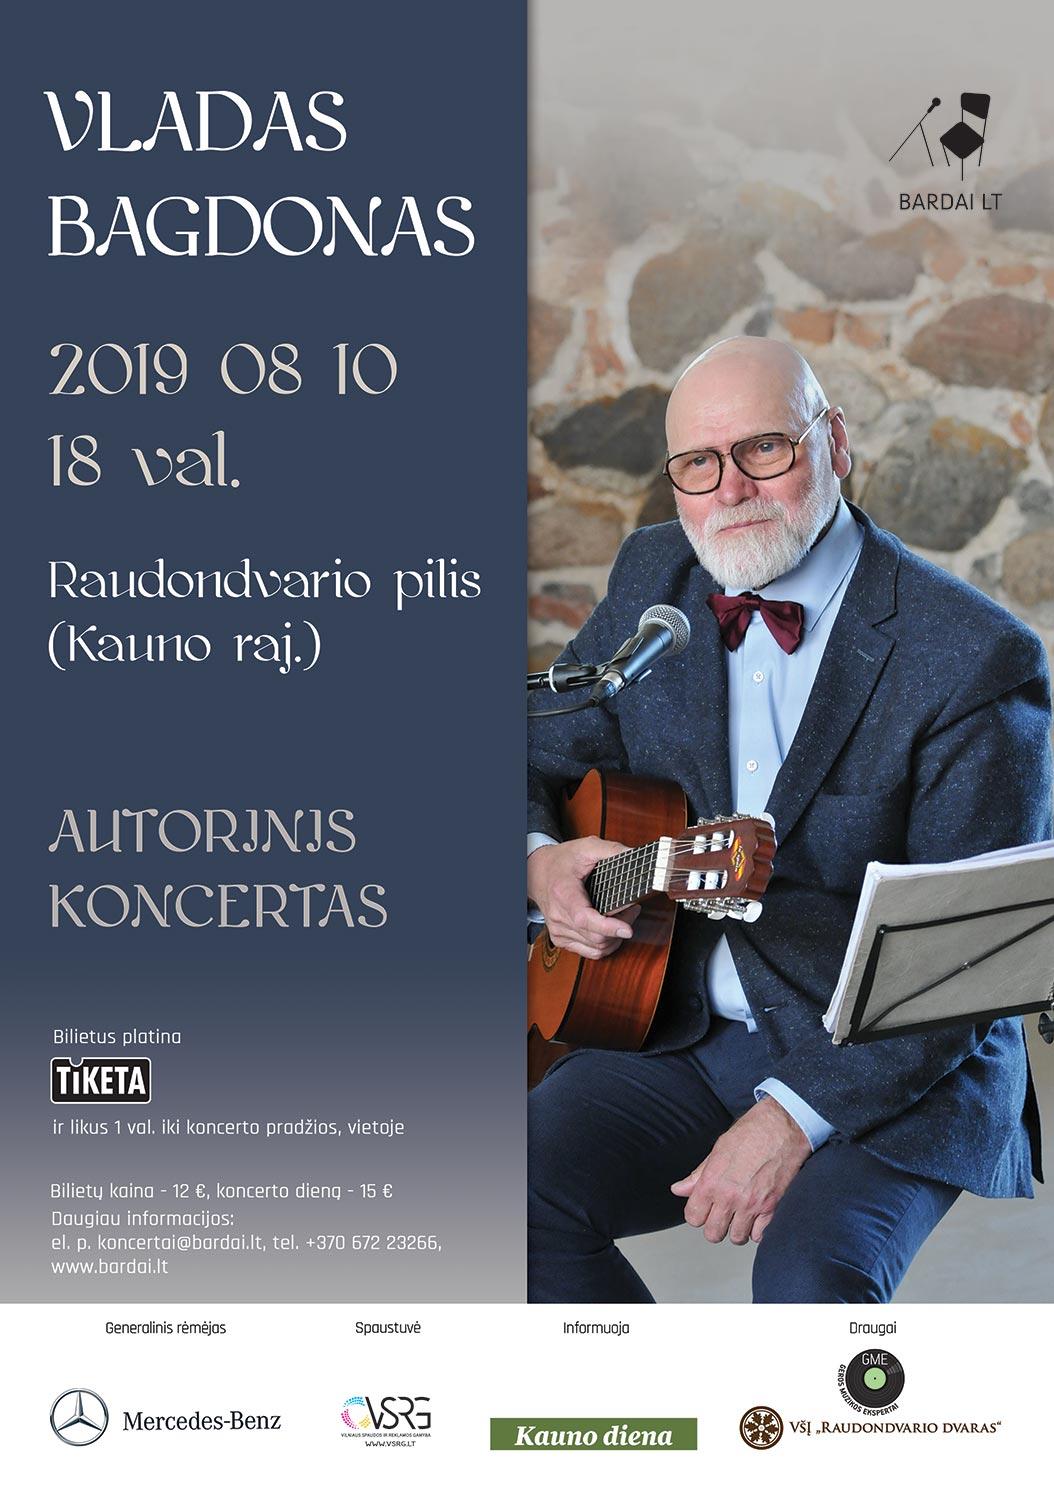 Vladas Bagdonas. Autorinis koncertas